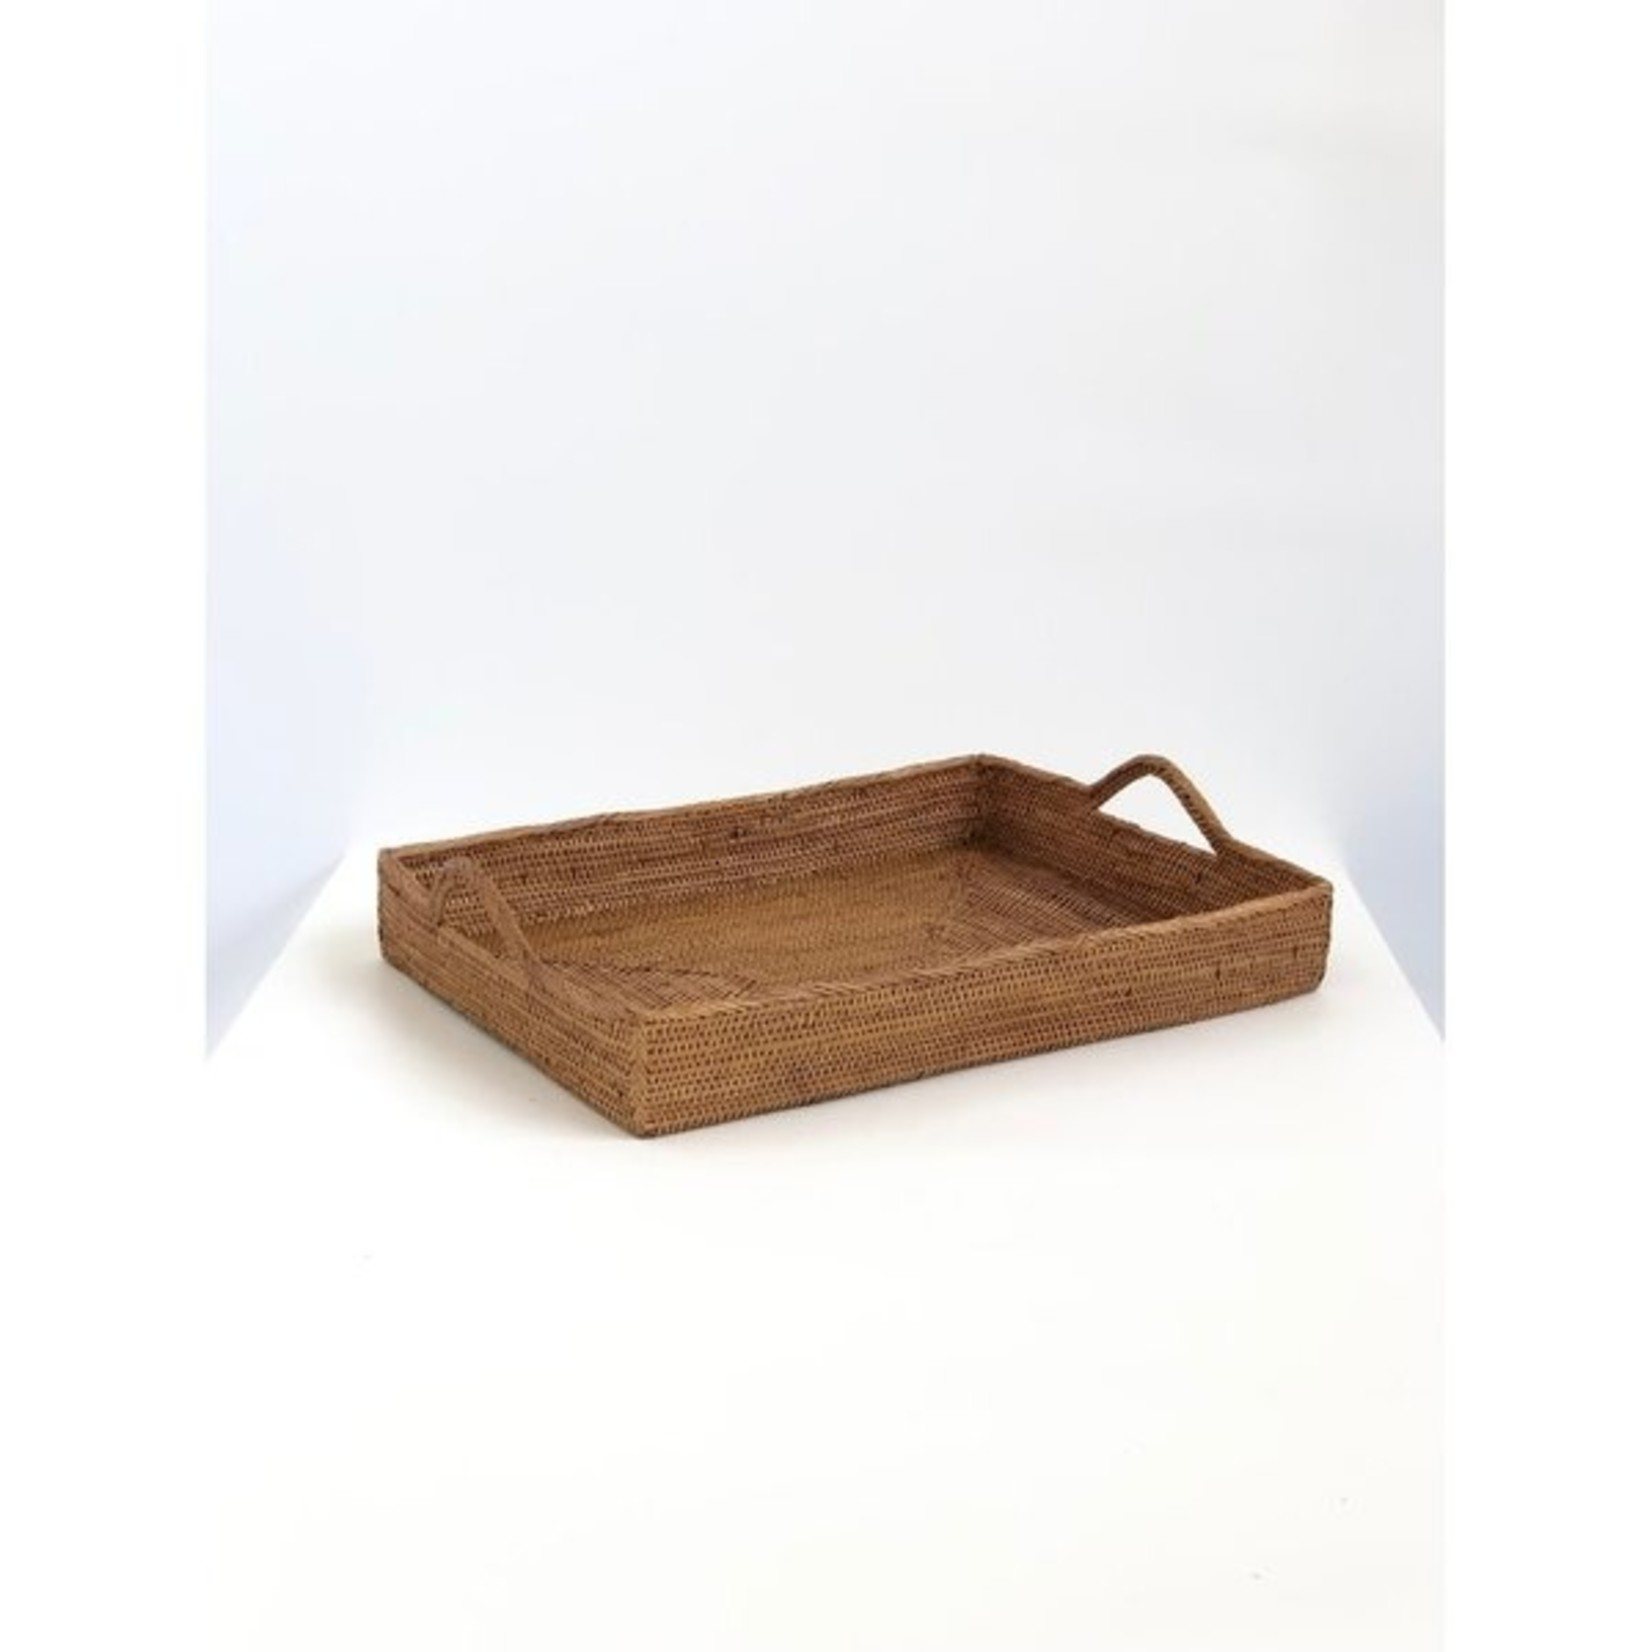 AndYu Ata Grass Serving Tray with Handles